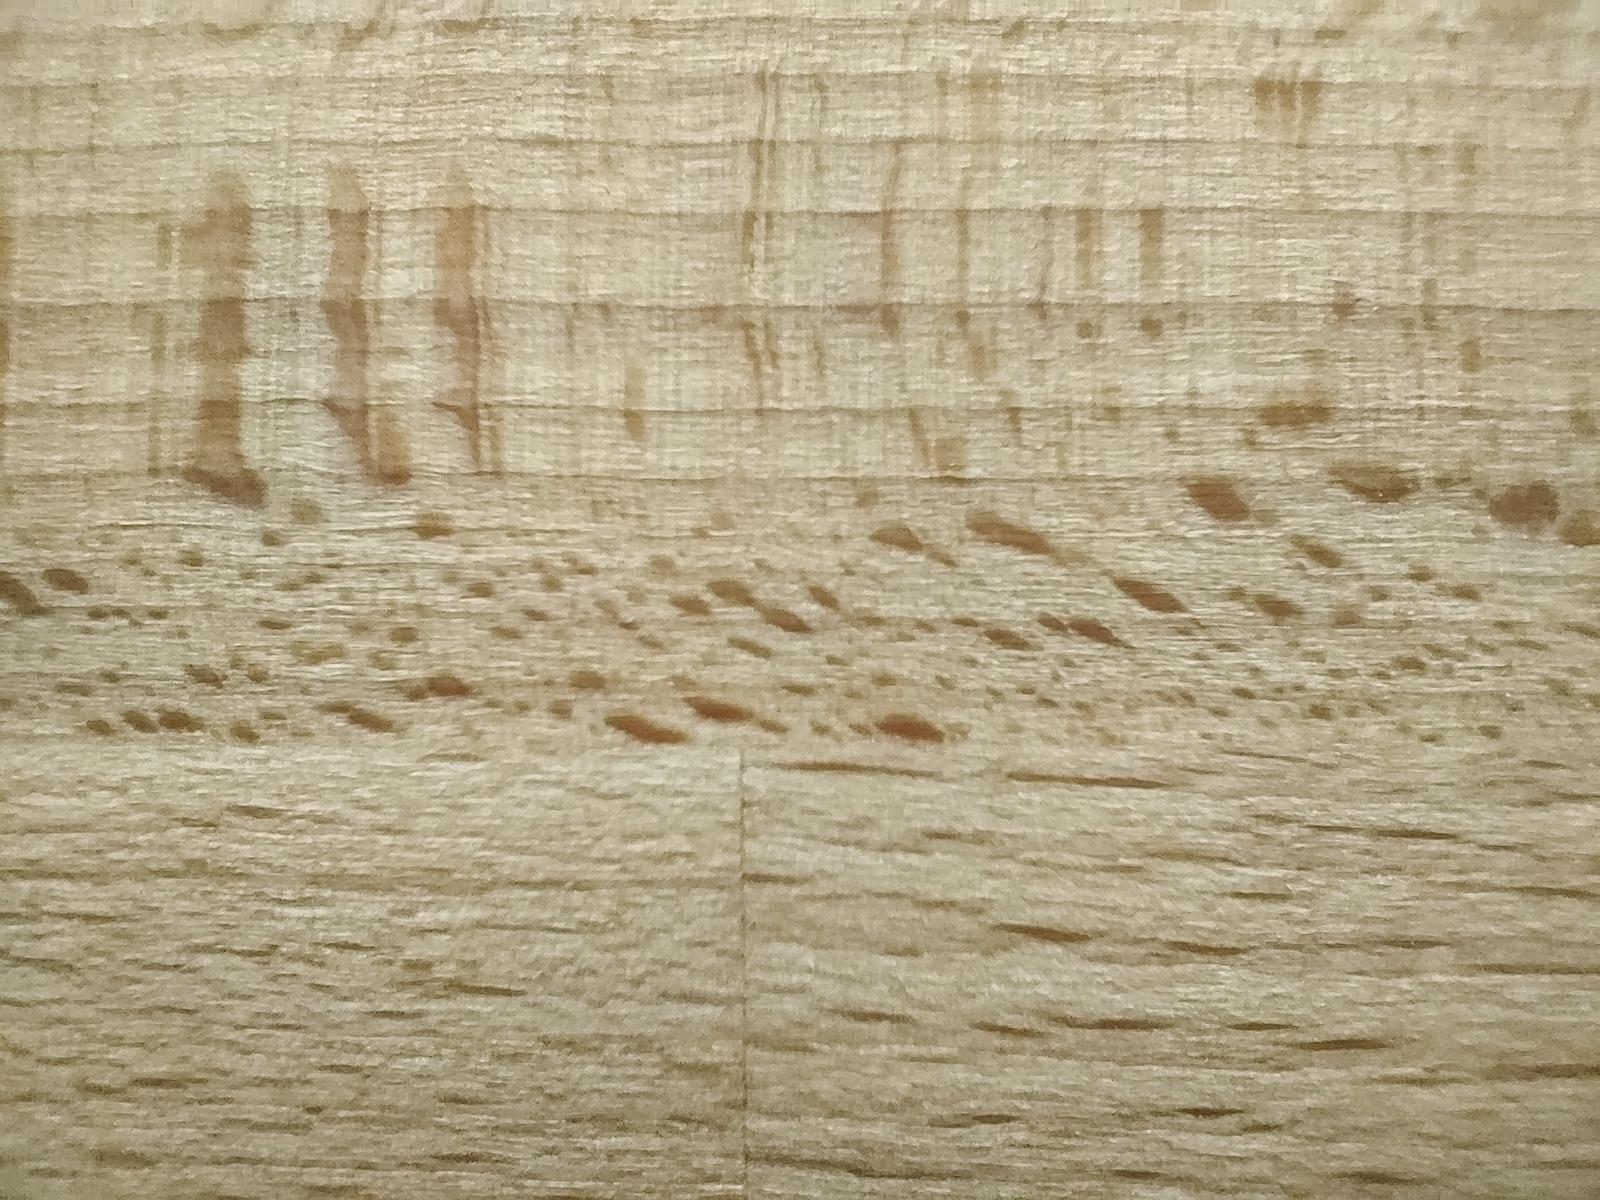 OnePlus Nord test image macro shot of wood table